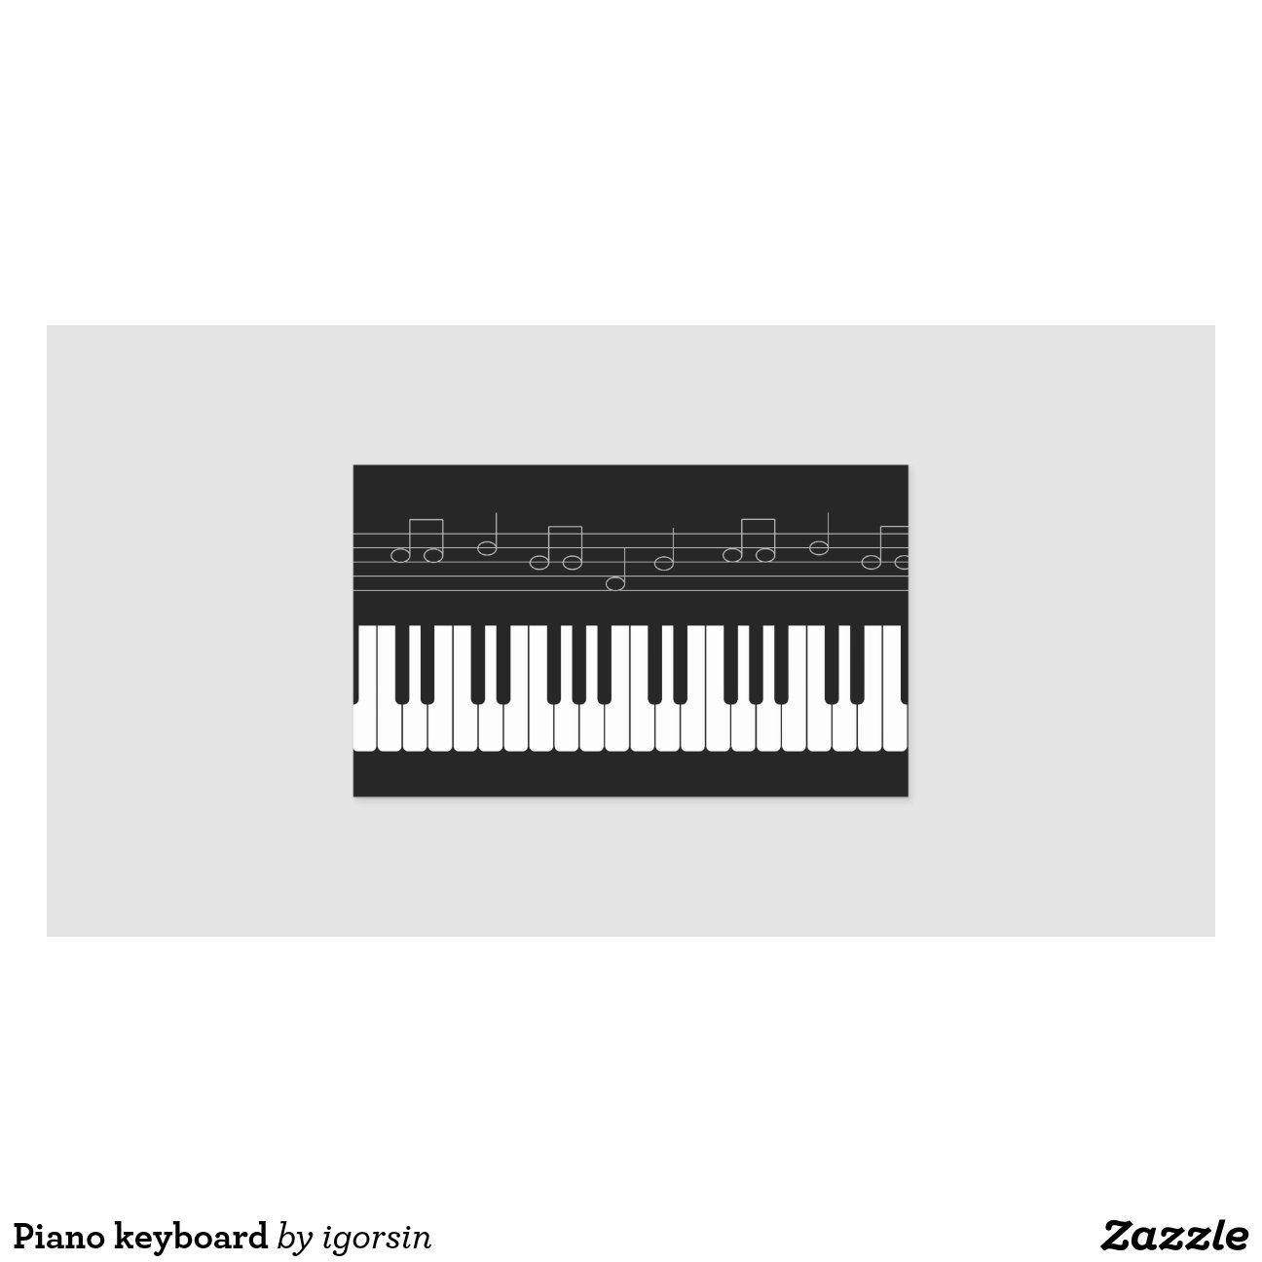 Aparador Madeira ~ Teclado de piano adesivo retangular Zazzle